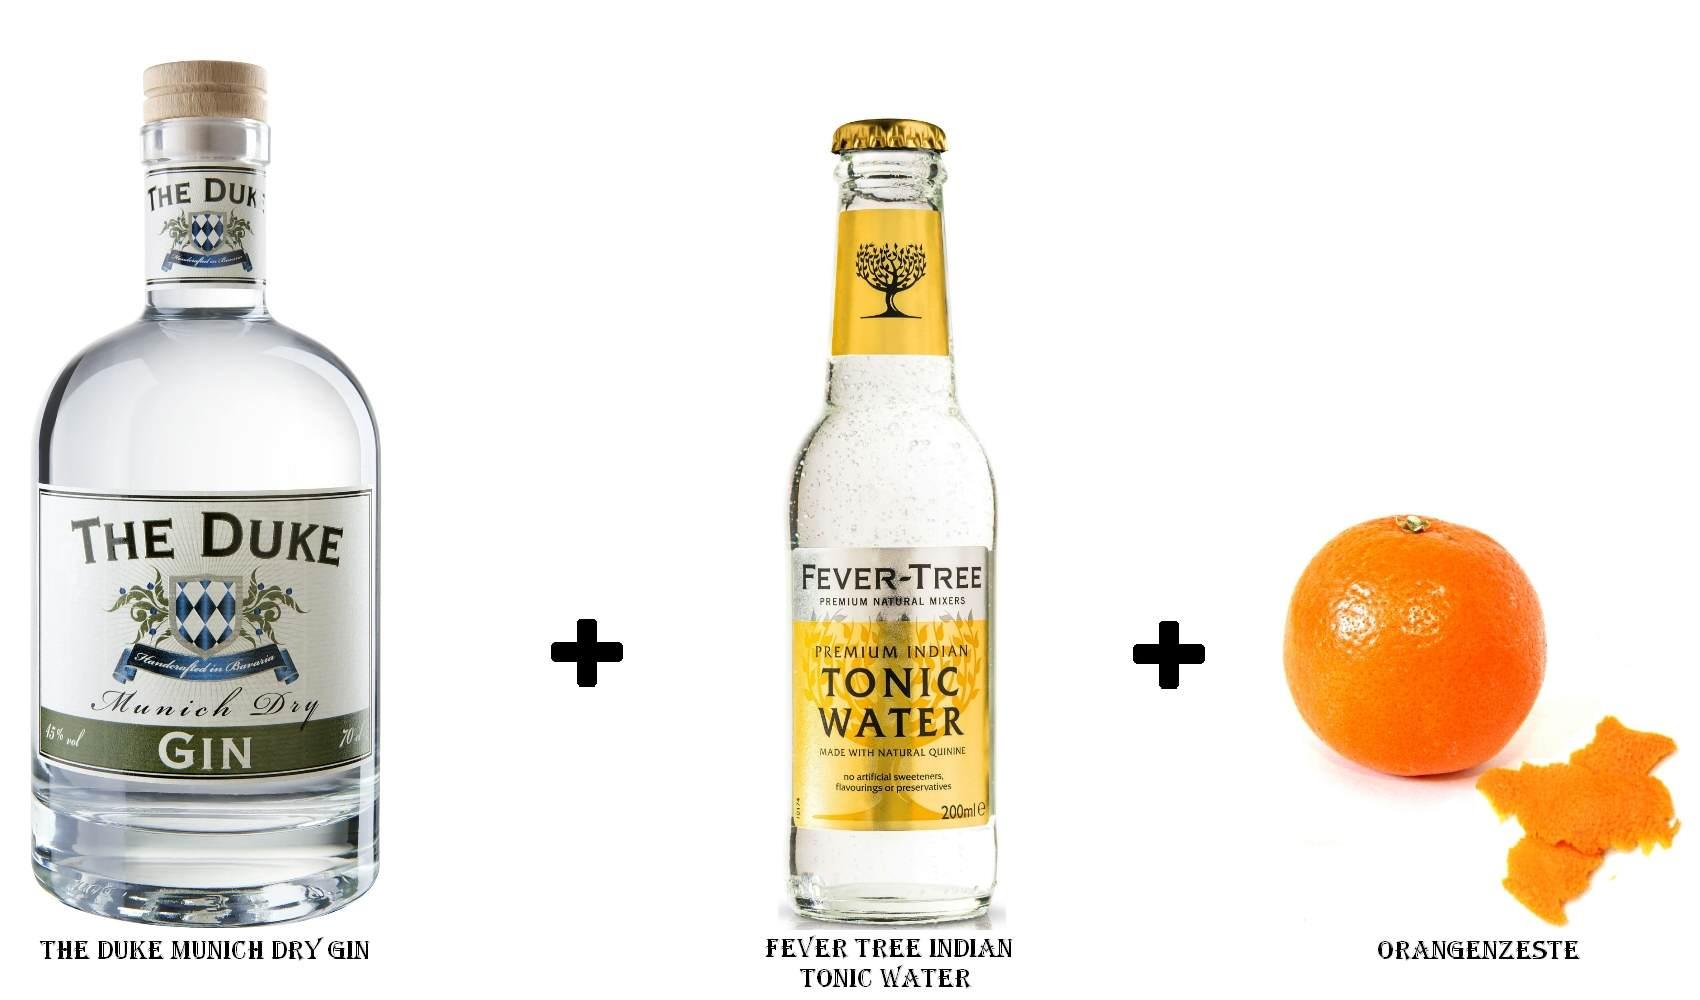 The Duke Munich Dry Gin + Fever Tree Indian Tonic Water + Orangenzeste